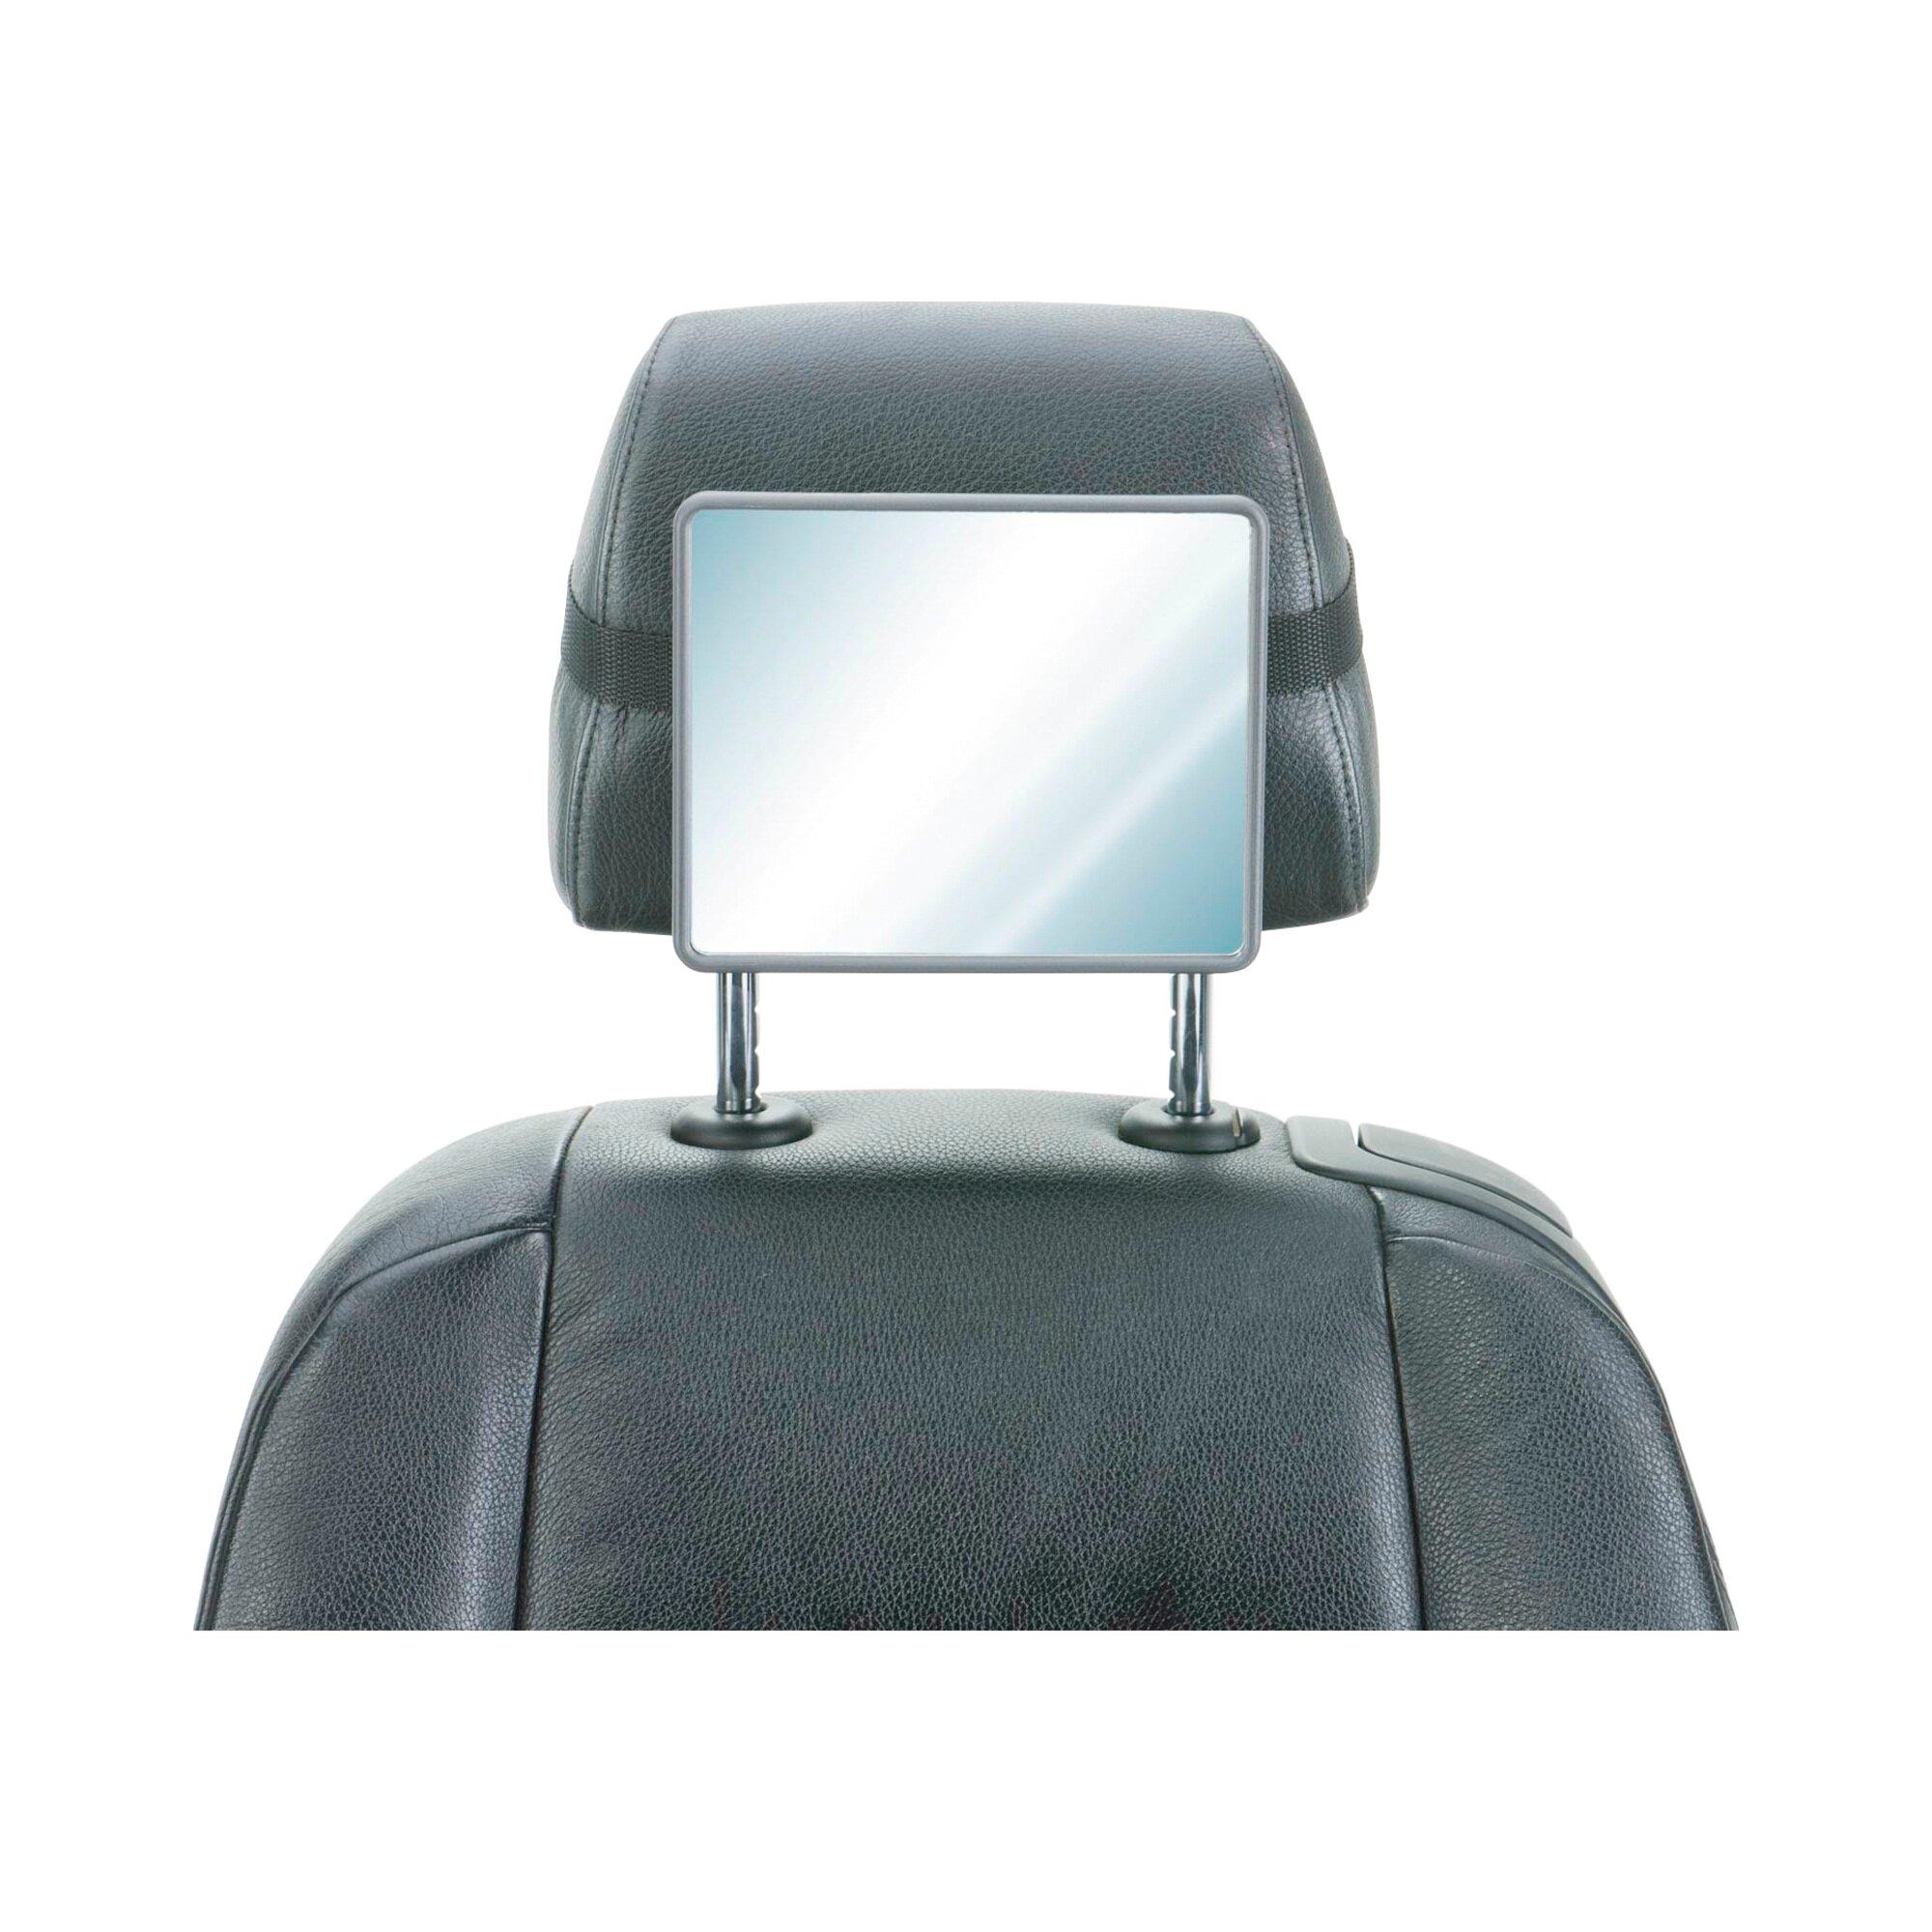 diago-sicherheitsspiegel-fur-autorucksitz-grau